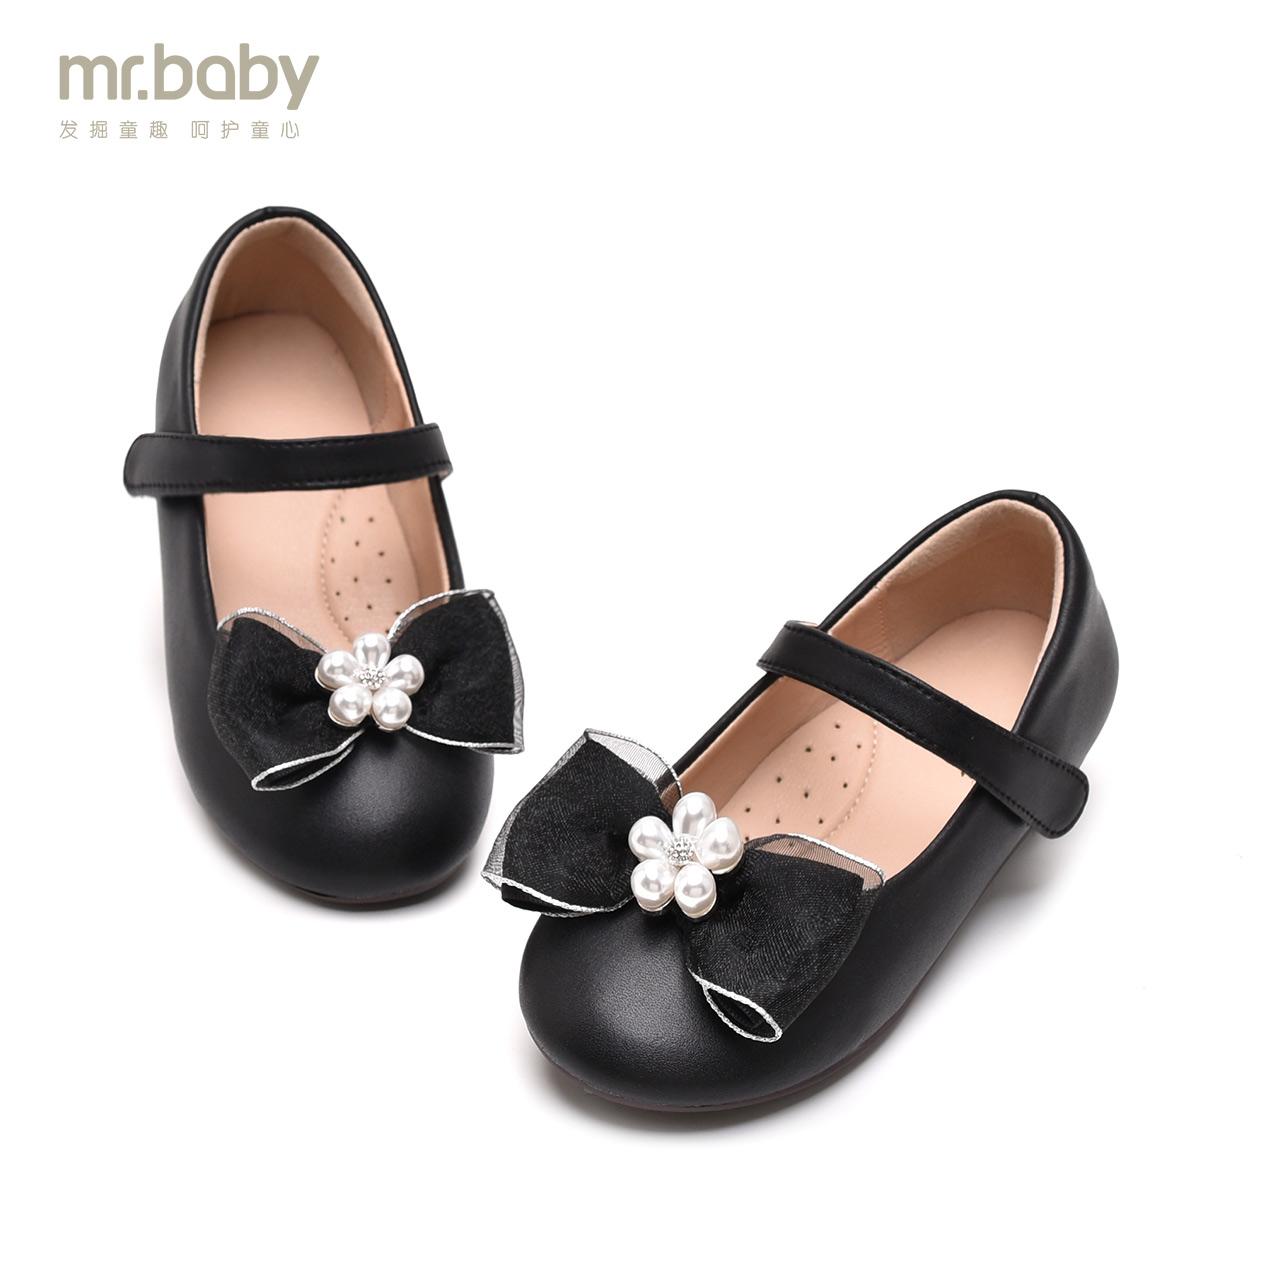 mrbaby鞋子童鞋2019软底演出鞋小女孩单鞋儿童公主鞋女童小皮鞋女